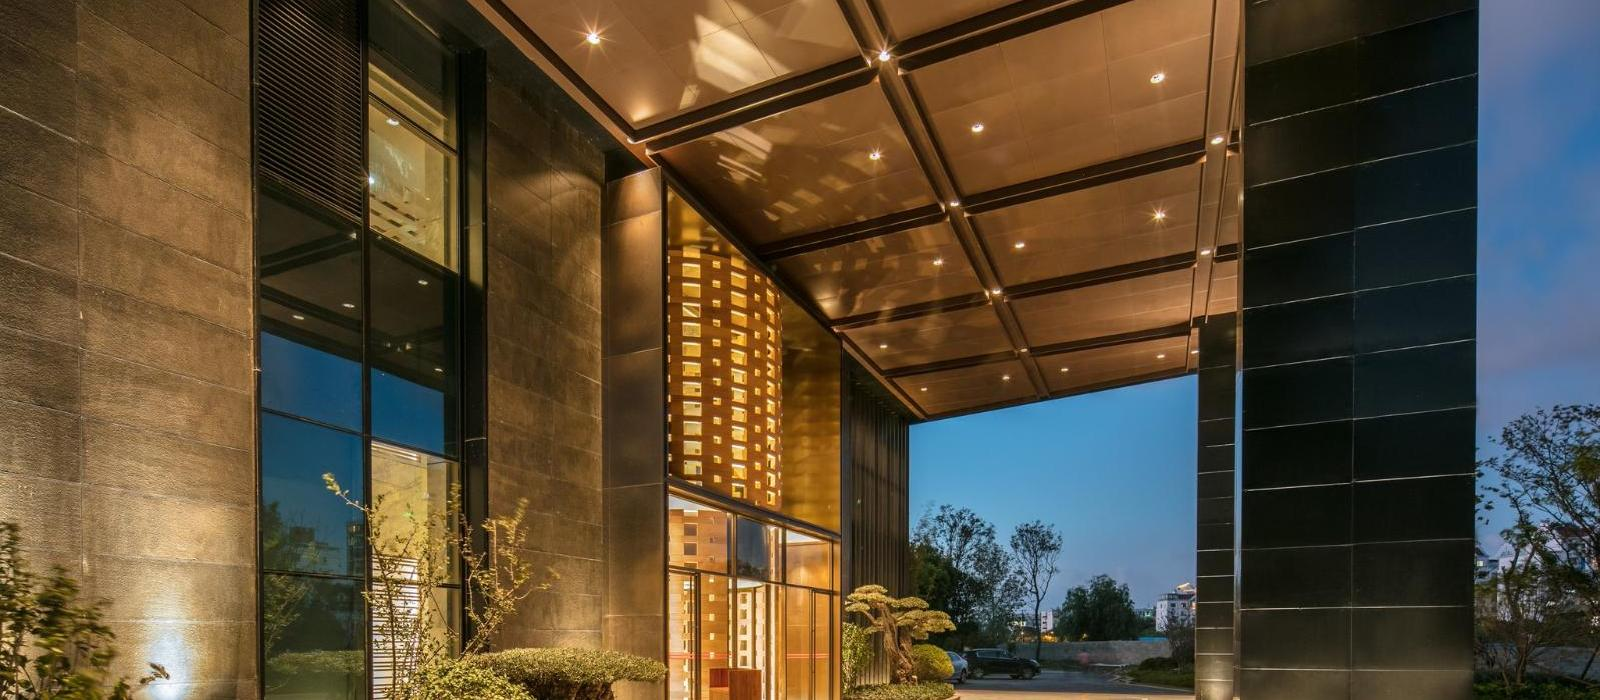 上海阿纳迪酒店(The Anandi Hotel and Spa) 图片  www.lhw.cn